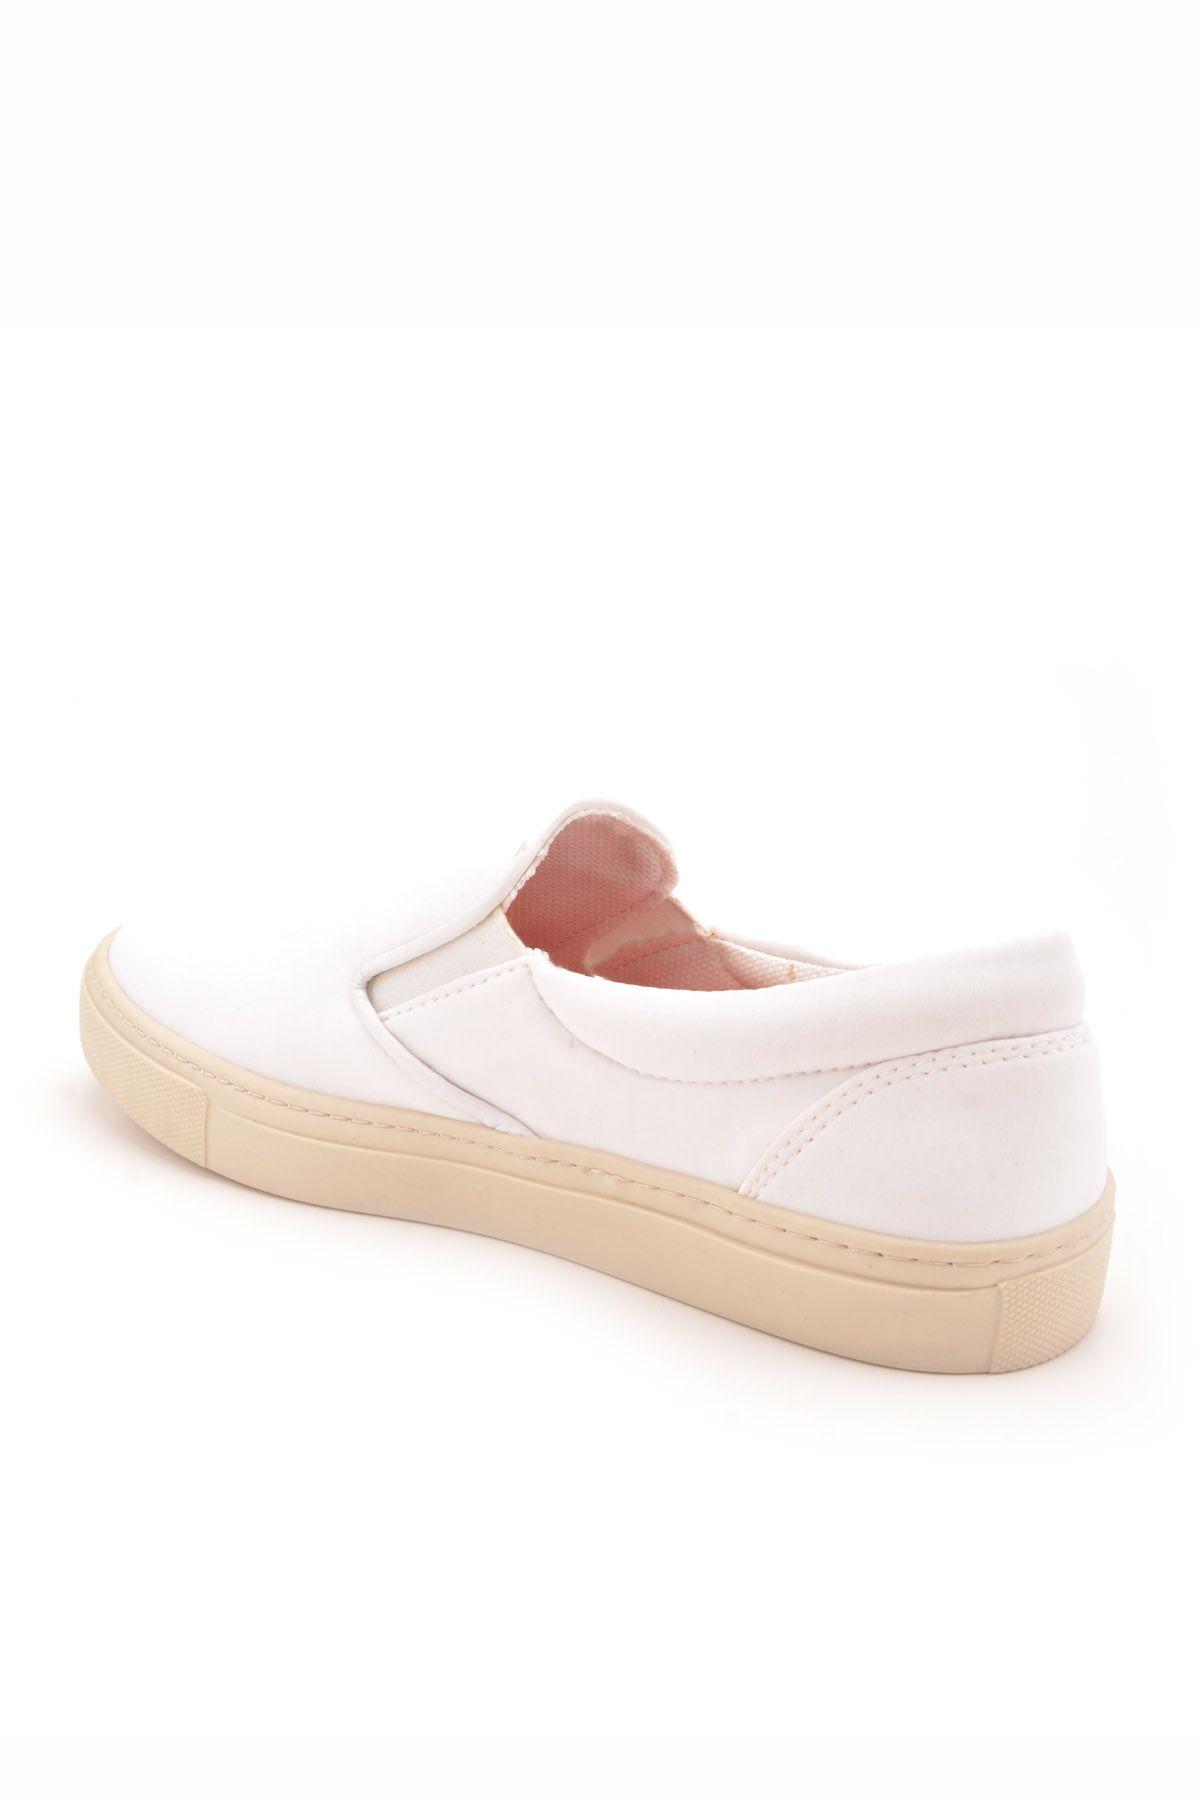 Art Goya Scuba Kumaş Bayan Sneaker  Beyaz